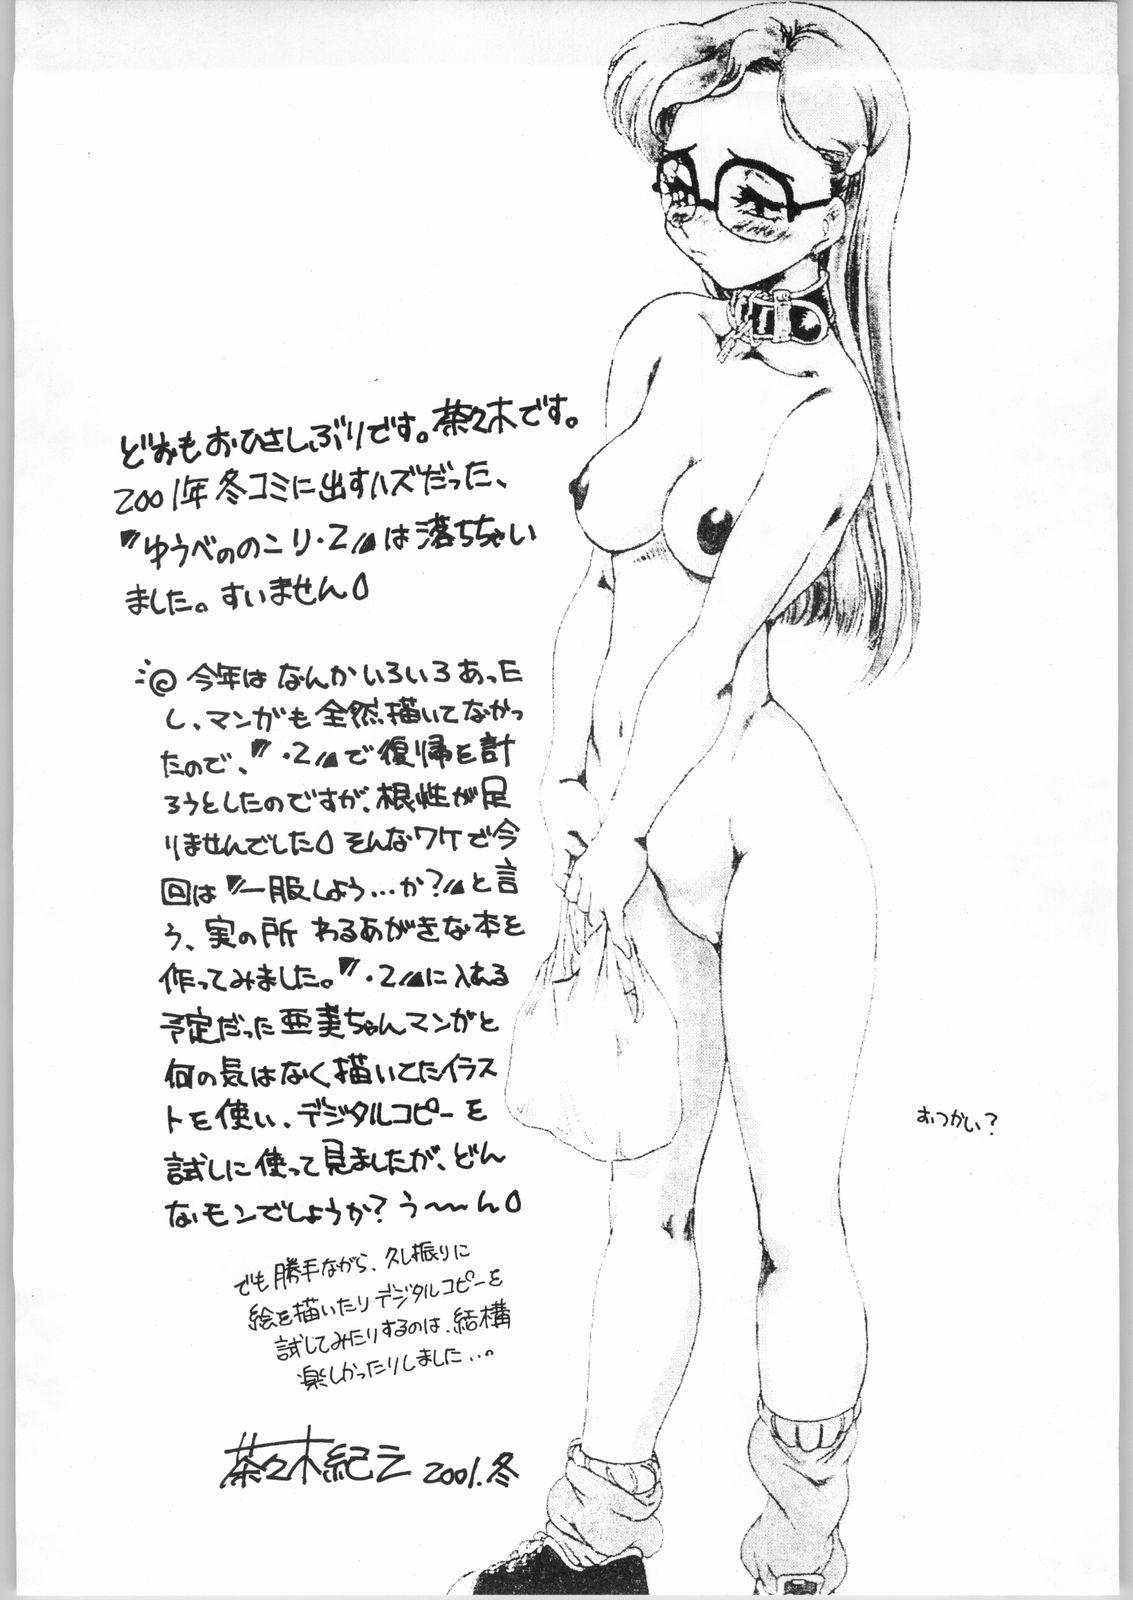 Ippuku shiyou ka? 2